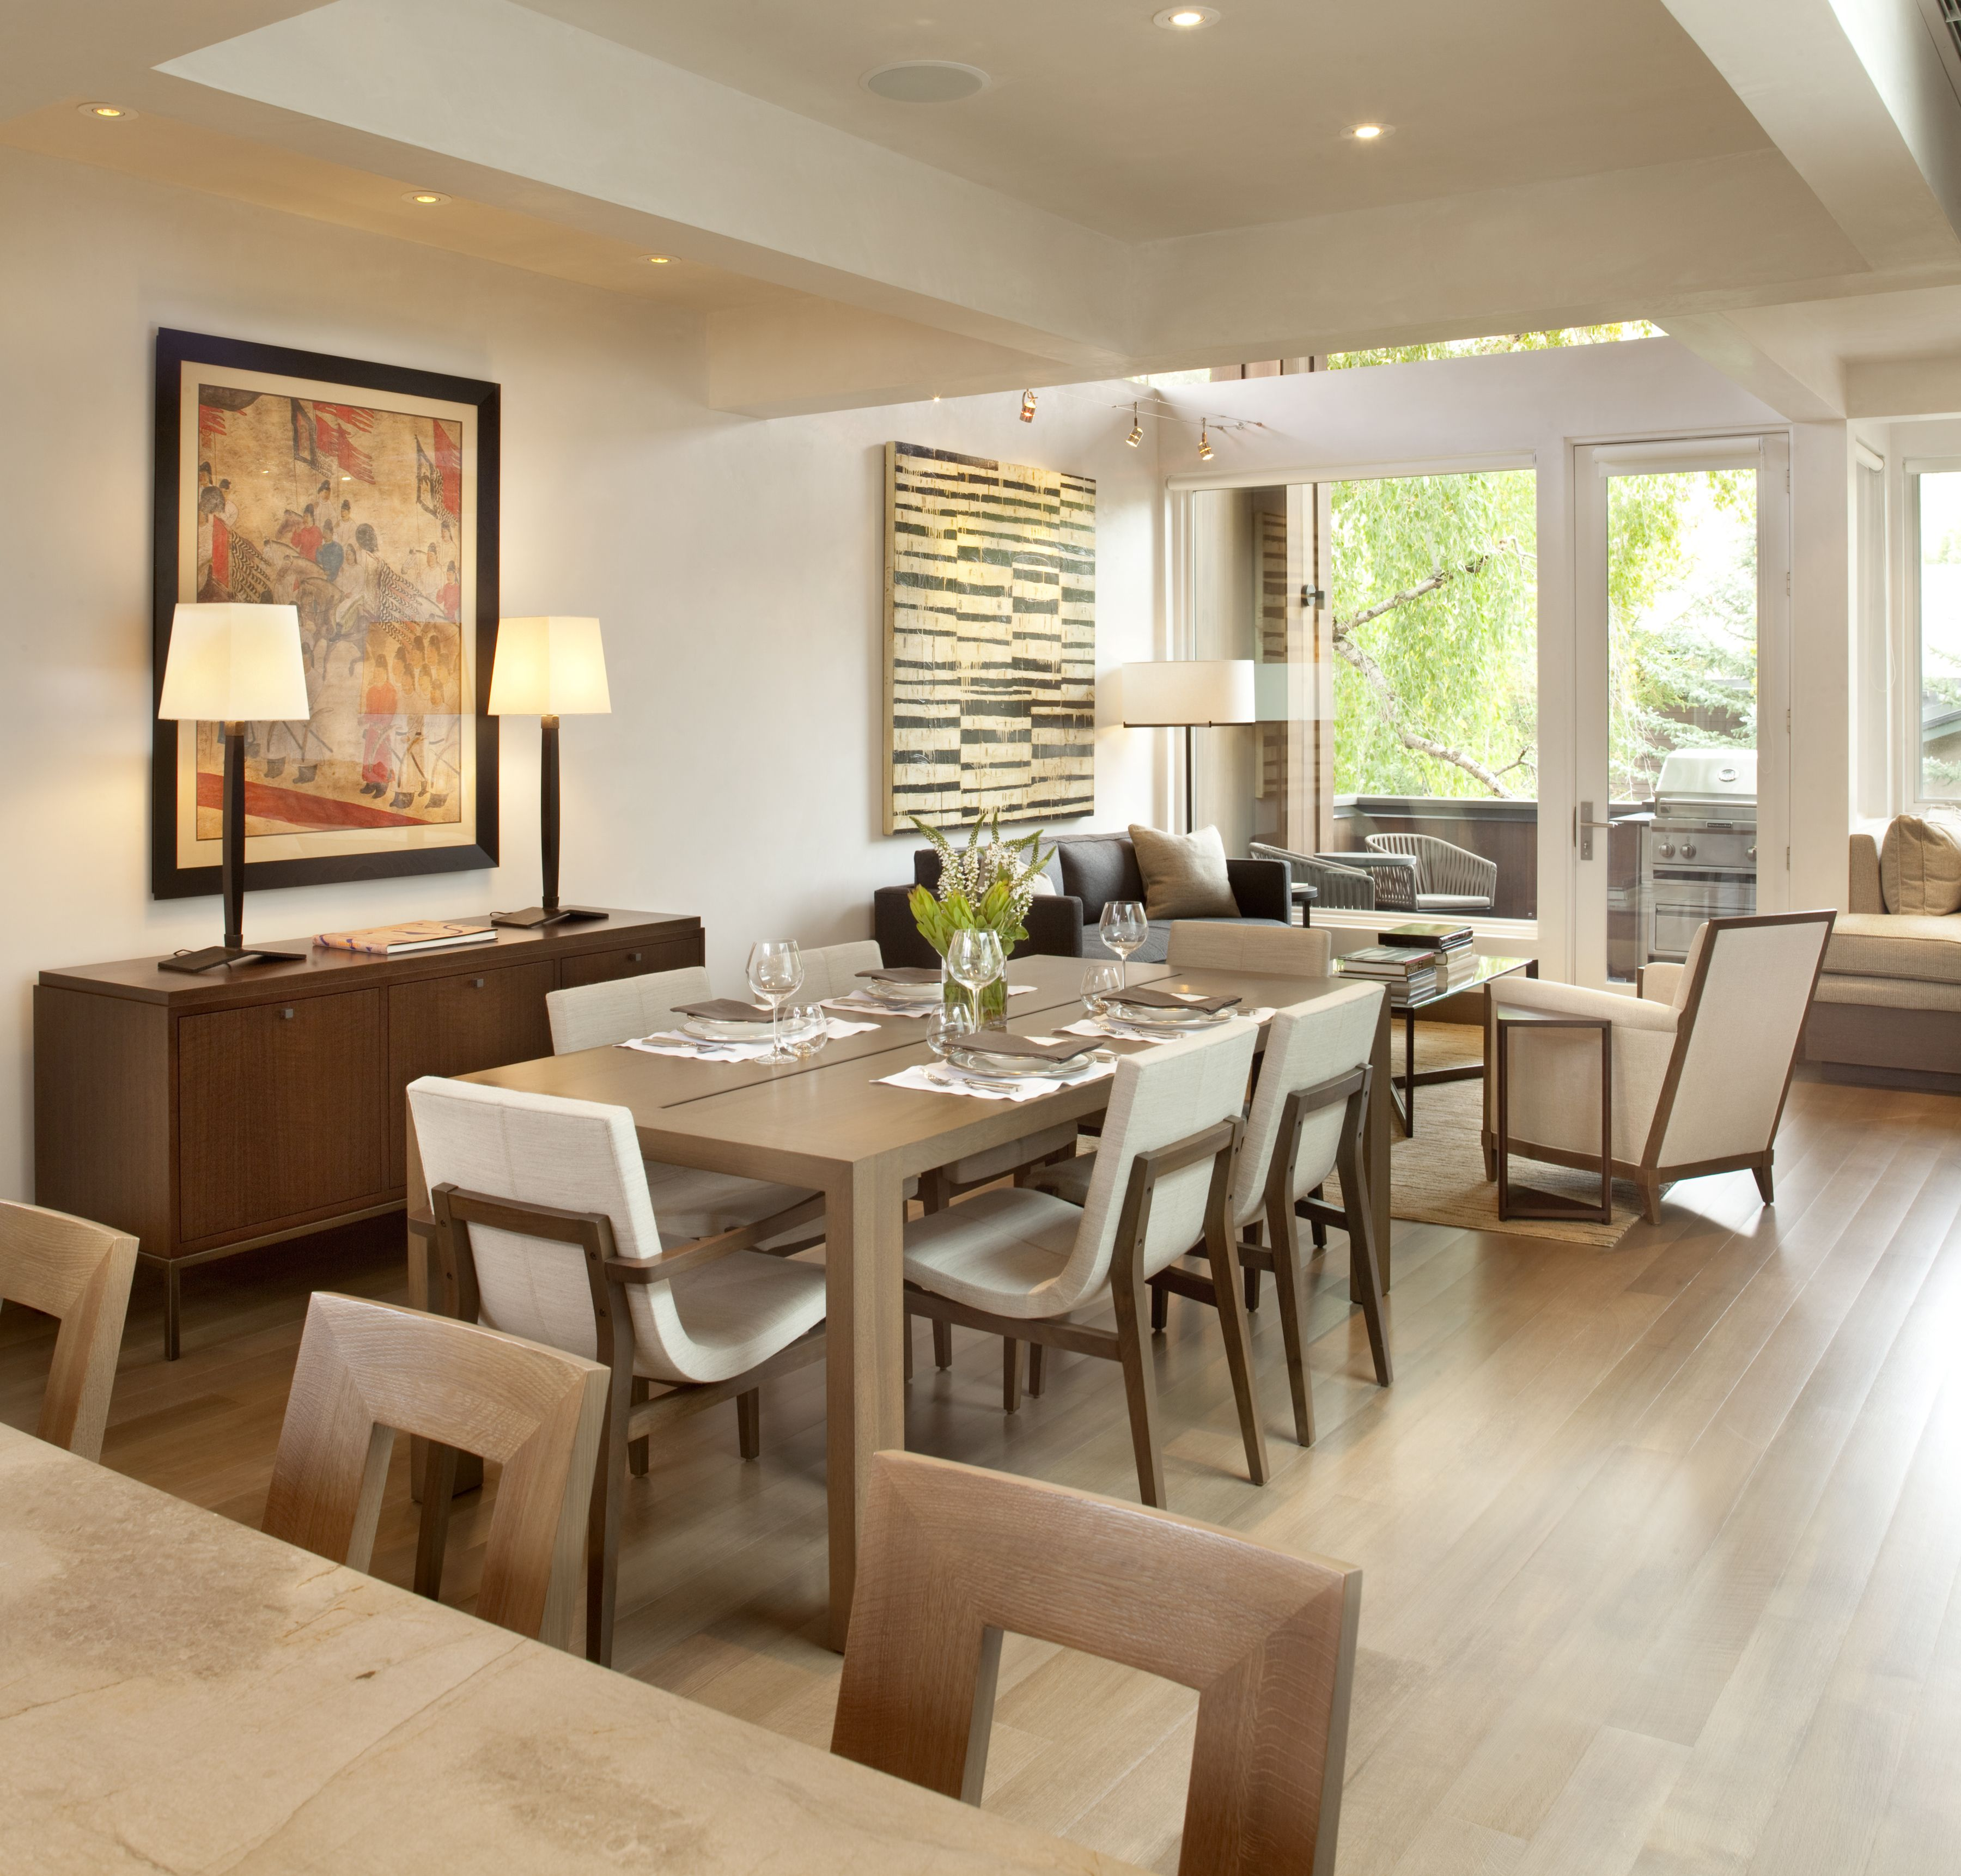 Caroline Edwards Interior Design, Troscan Dining Table, Holly Hunt Chairs.  Www.carolineedwards